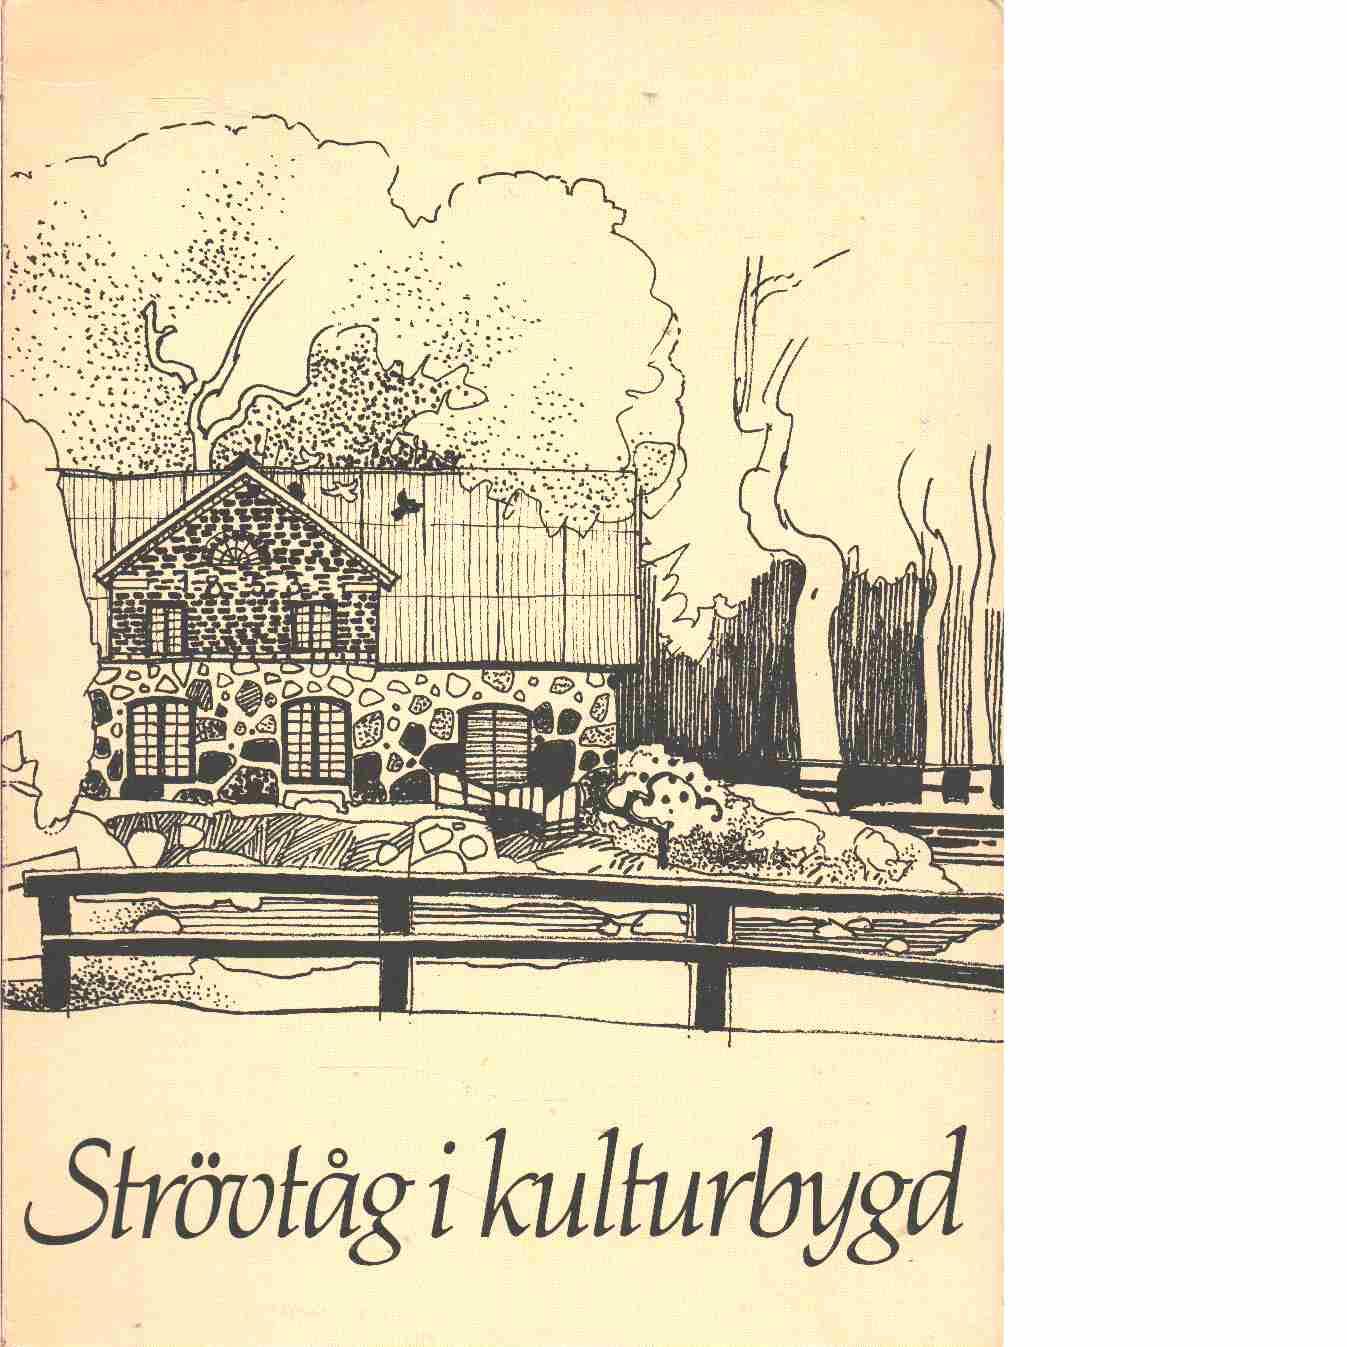 Strövtåg i kulturbygd / utg. av Sydkraft i samband med 75-årsjubileet 1981  - Red. Evers, Tore